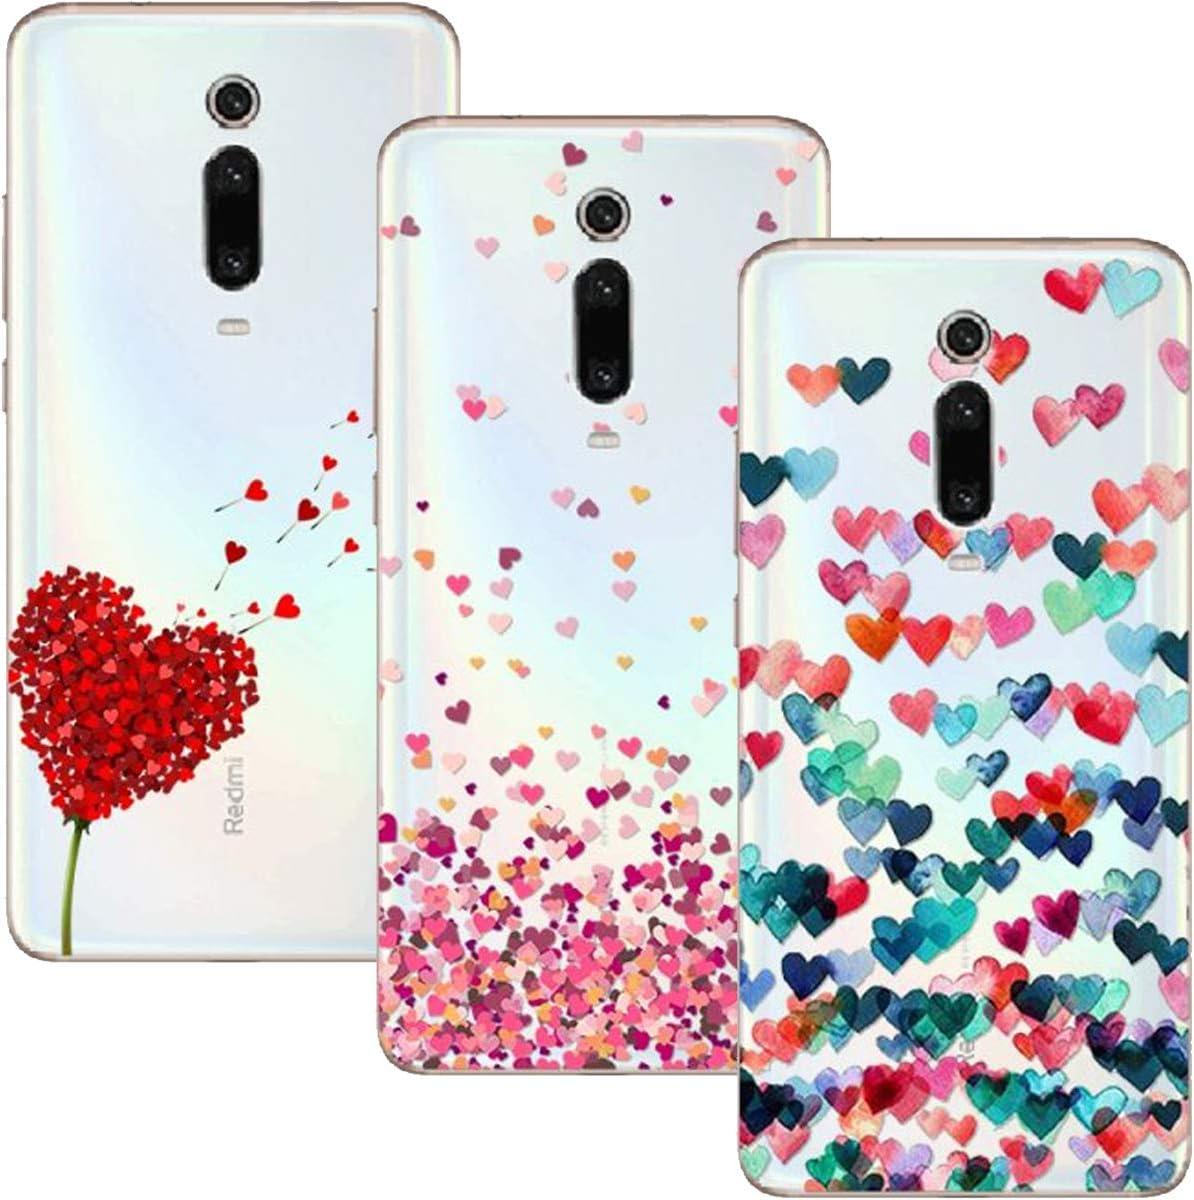 Funda Xiaomi Mi 9T Pro/Mi 9T, (3 Pack) Transparente Ultrafina Carcasa Delgado Antigolpes Resistente, Amor